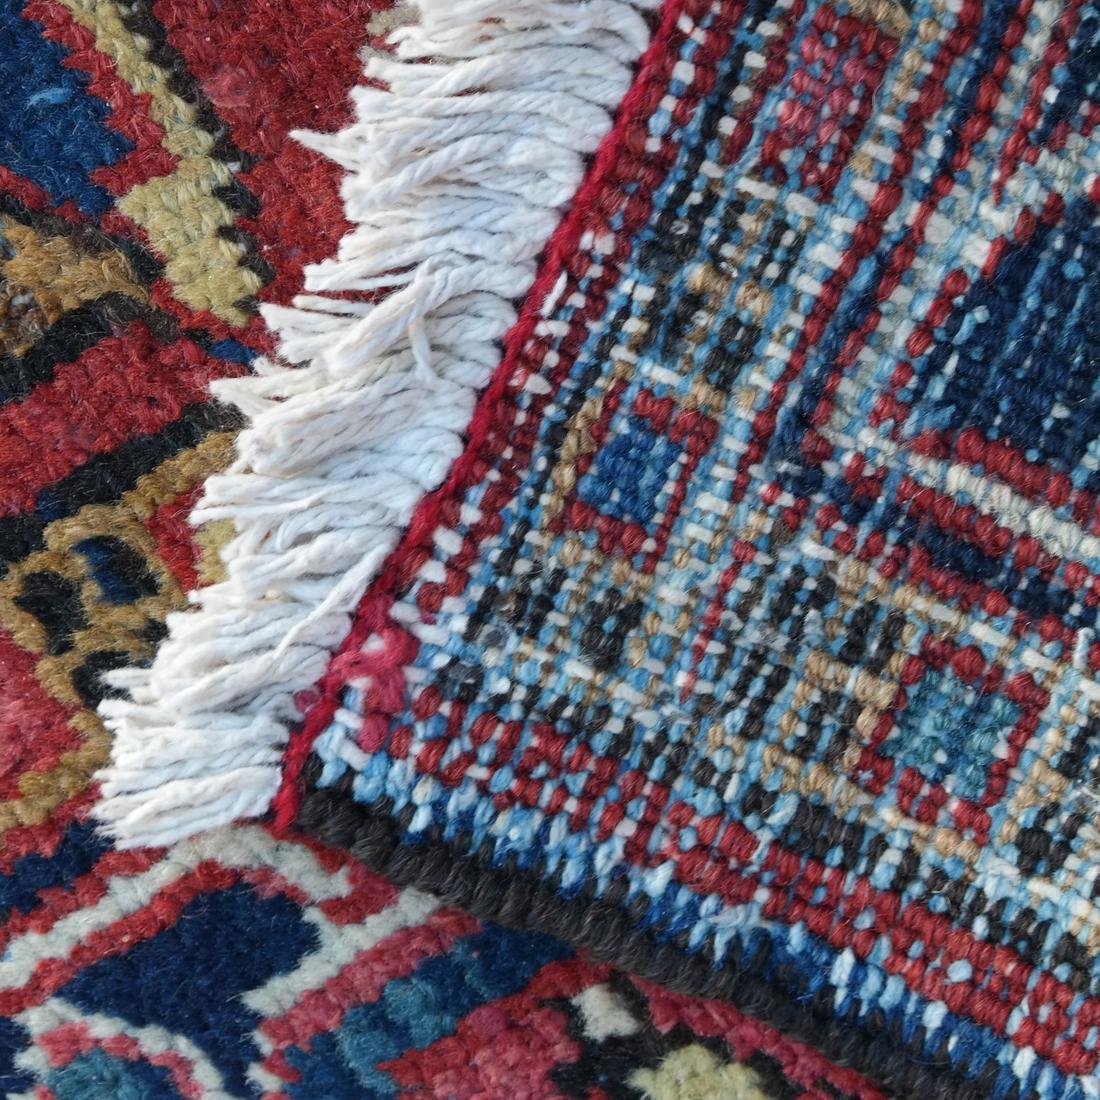 Antique Iranian Heriz Carpet, 9 x 12 - 8